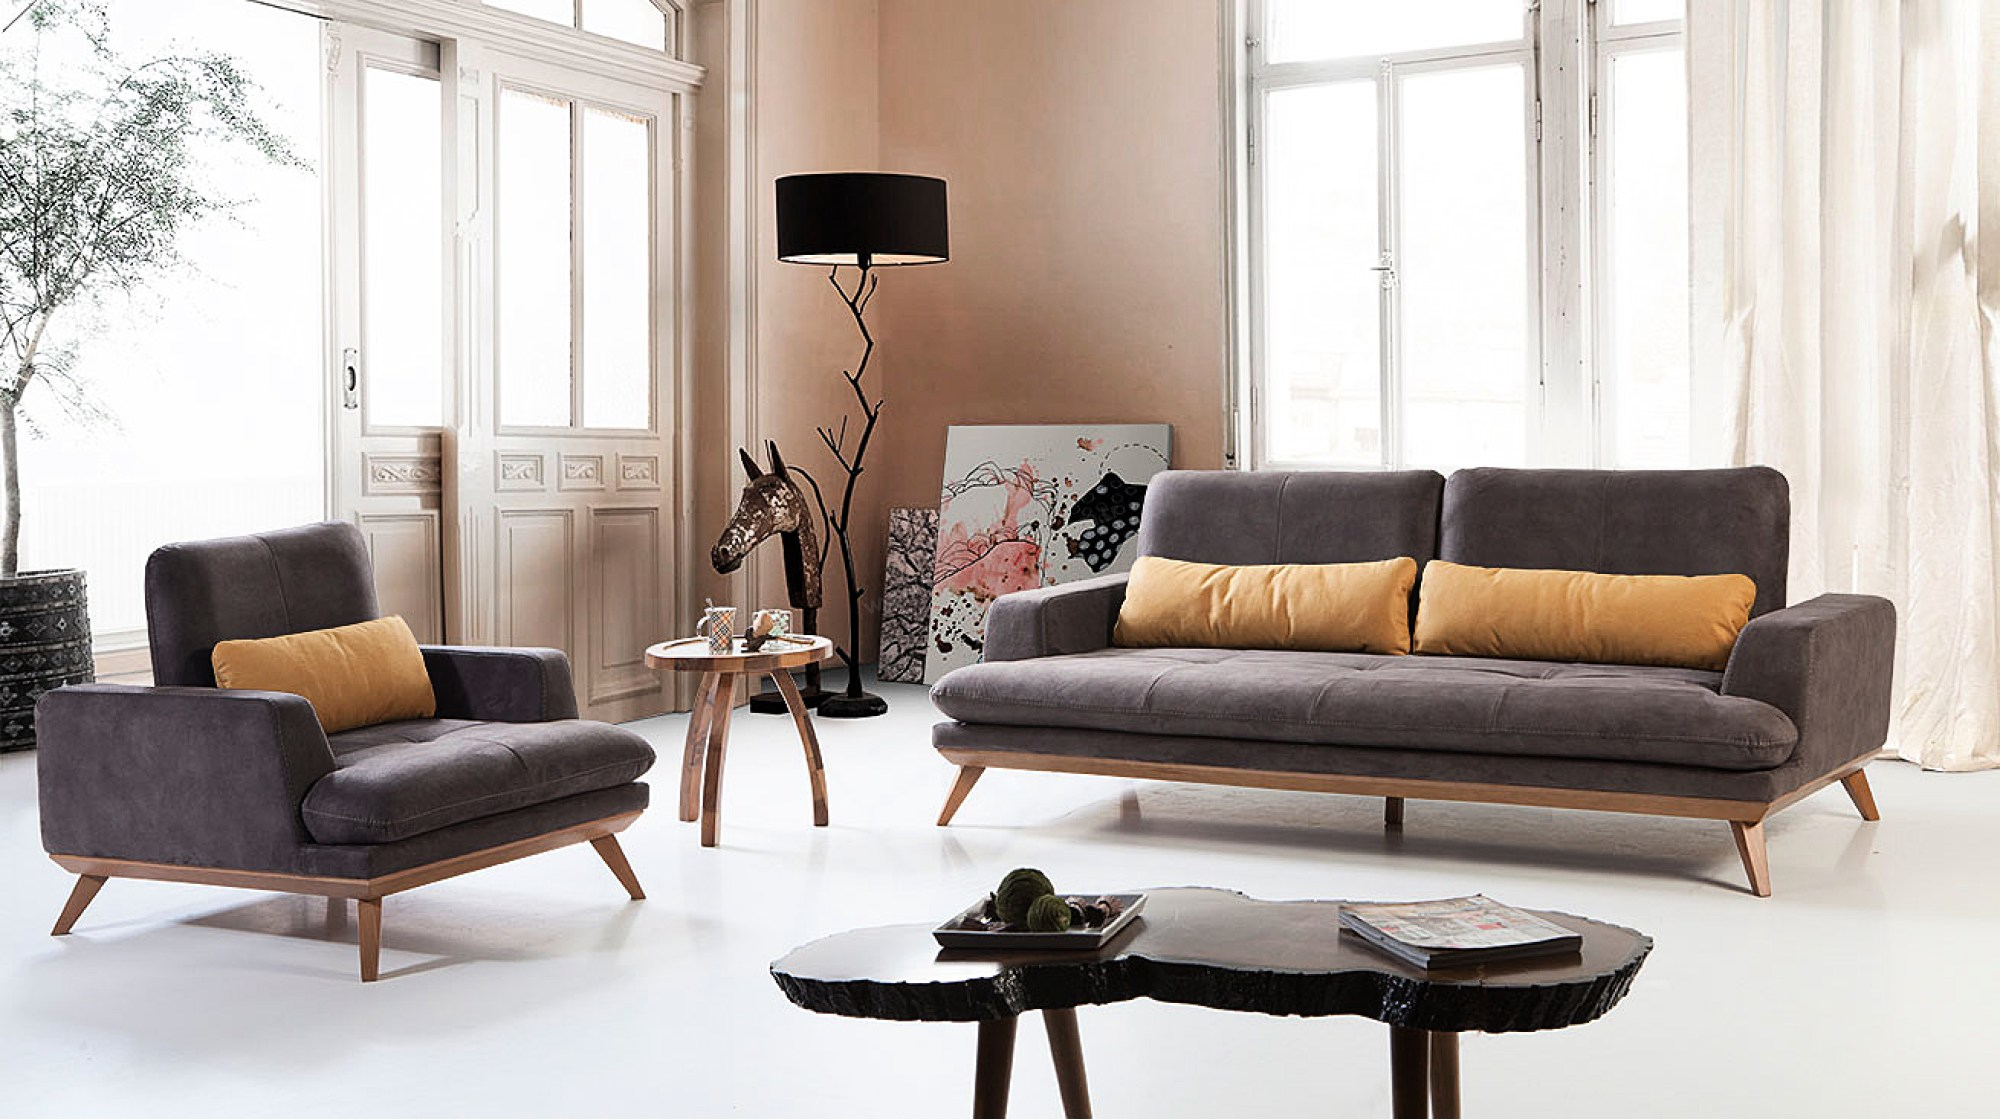 soho modern koltuk tak m koltuk tak mlar berke mobilya. Black Bedroom Furniture Sets. Home Design Ideas